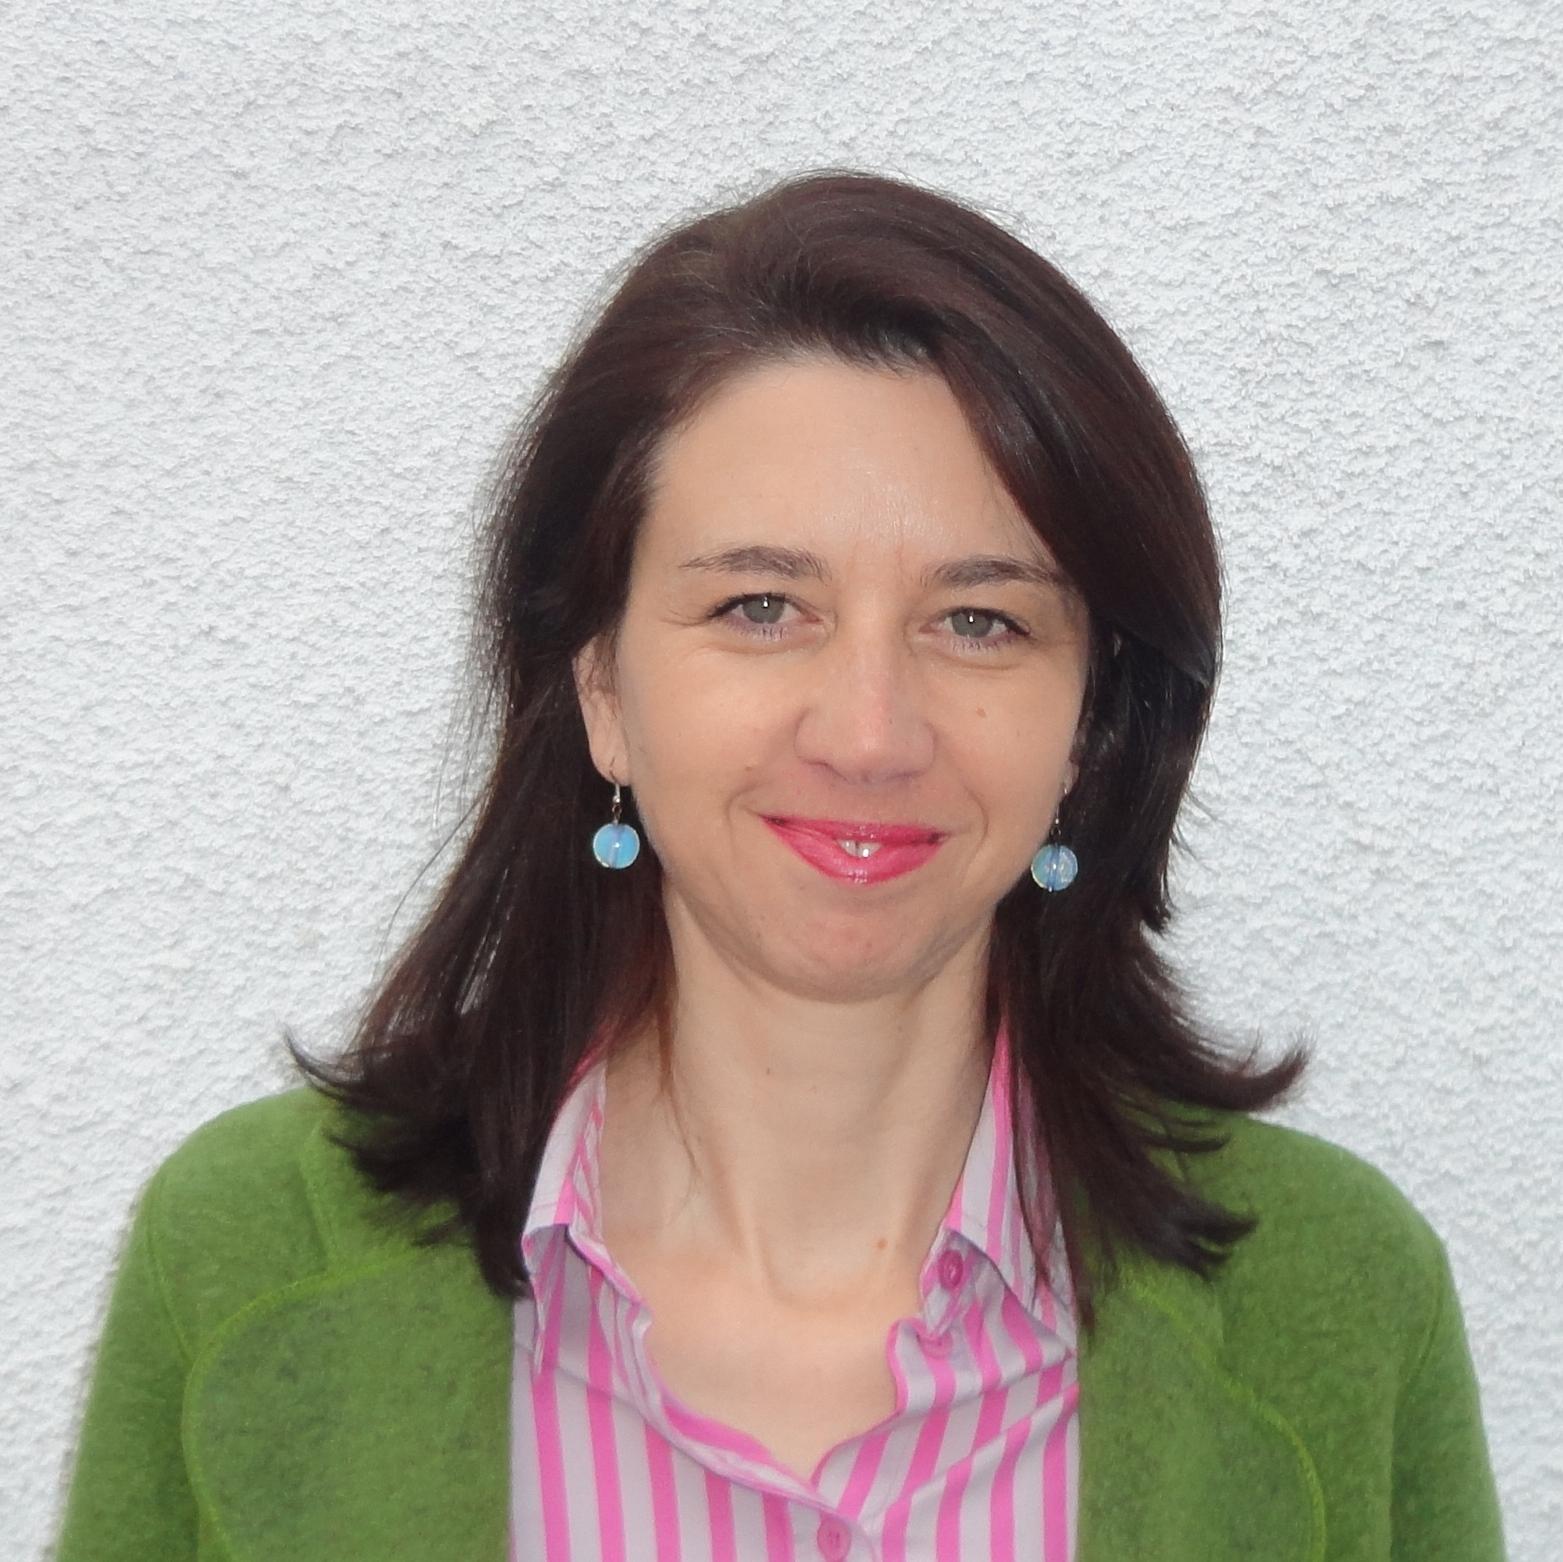 Людмила Милушева